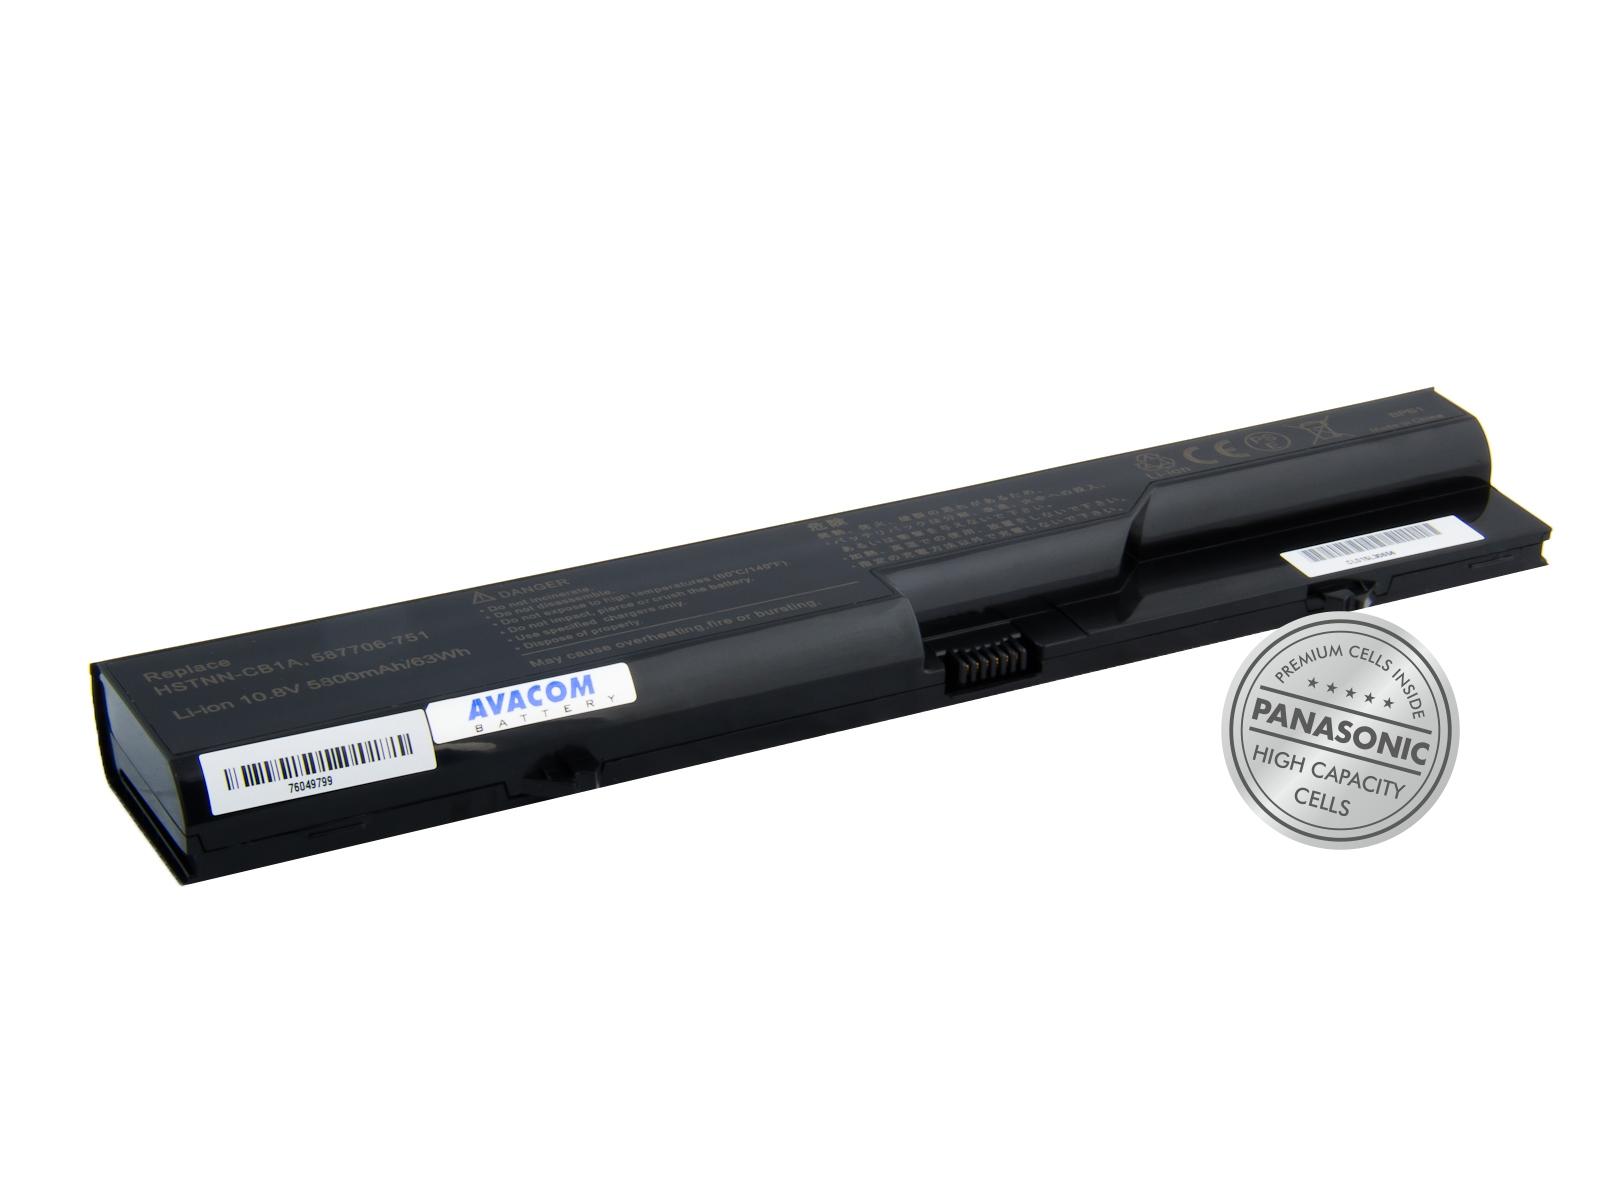 Baterie AVACOM NOHP-PB20-P29 pro HP ProBook 4320s/4420s/4520s series Li-Ion 10,8V 5800mAh/63Wh